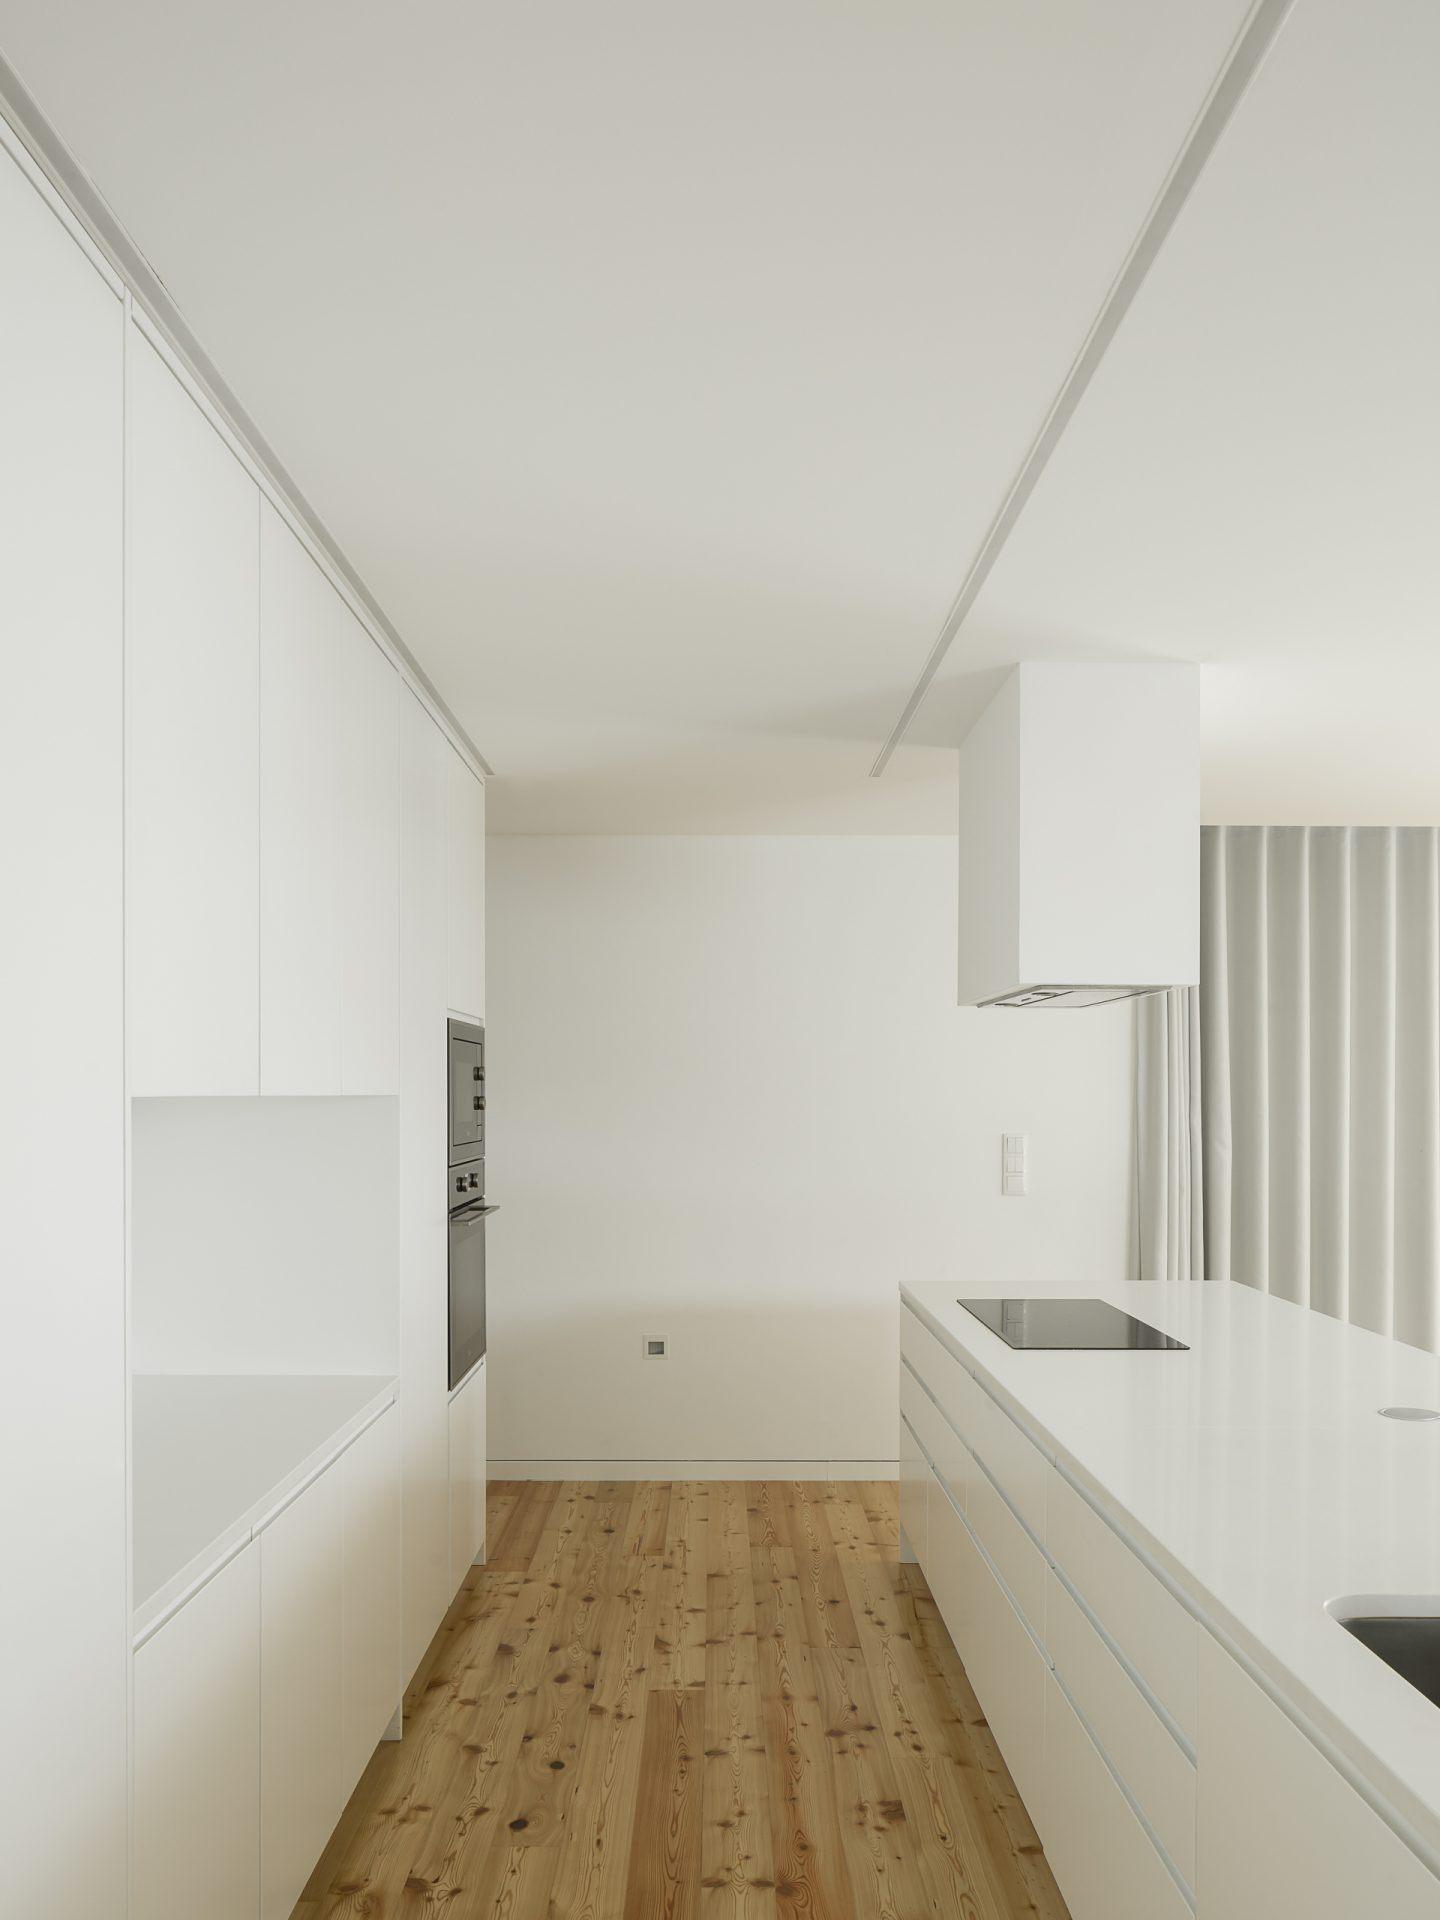 IGNANT-Architecture-BDArquitectura-Gloma-House-010